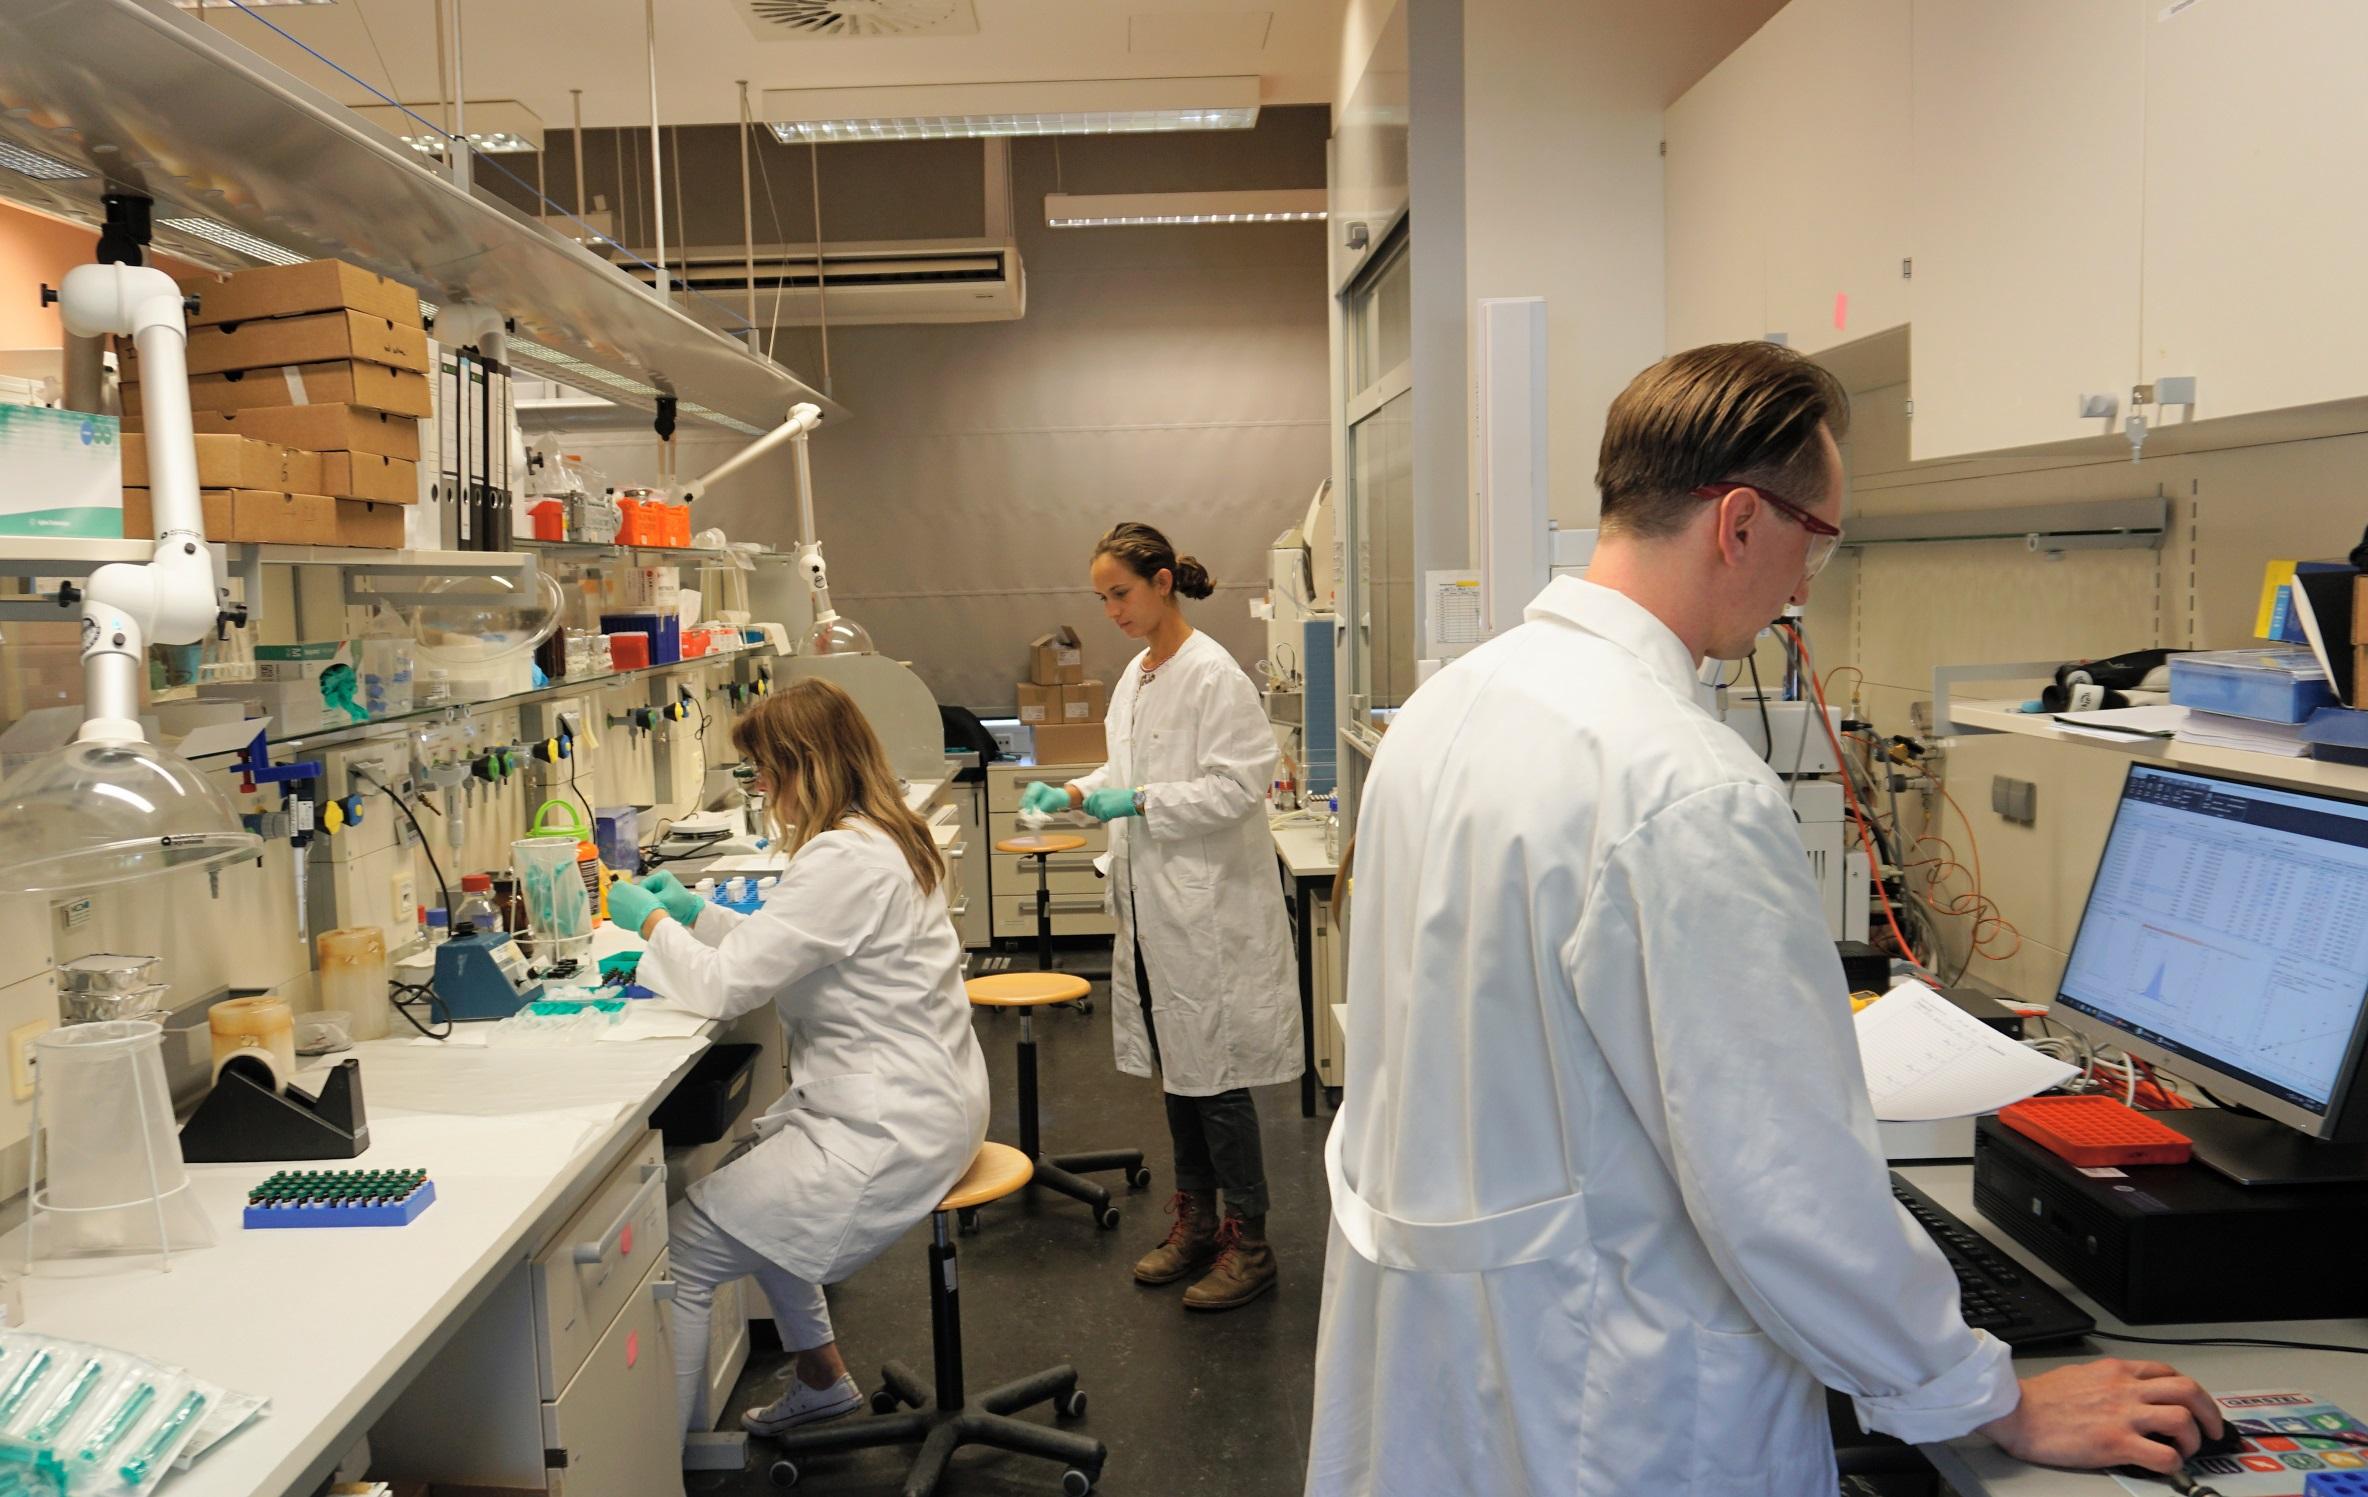 lab laboratory bakanov honert ansorge ecotoxicology brühl bruhl community ecology DINA NABU